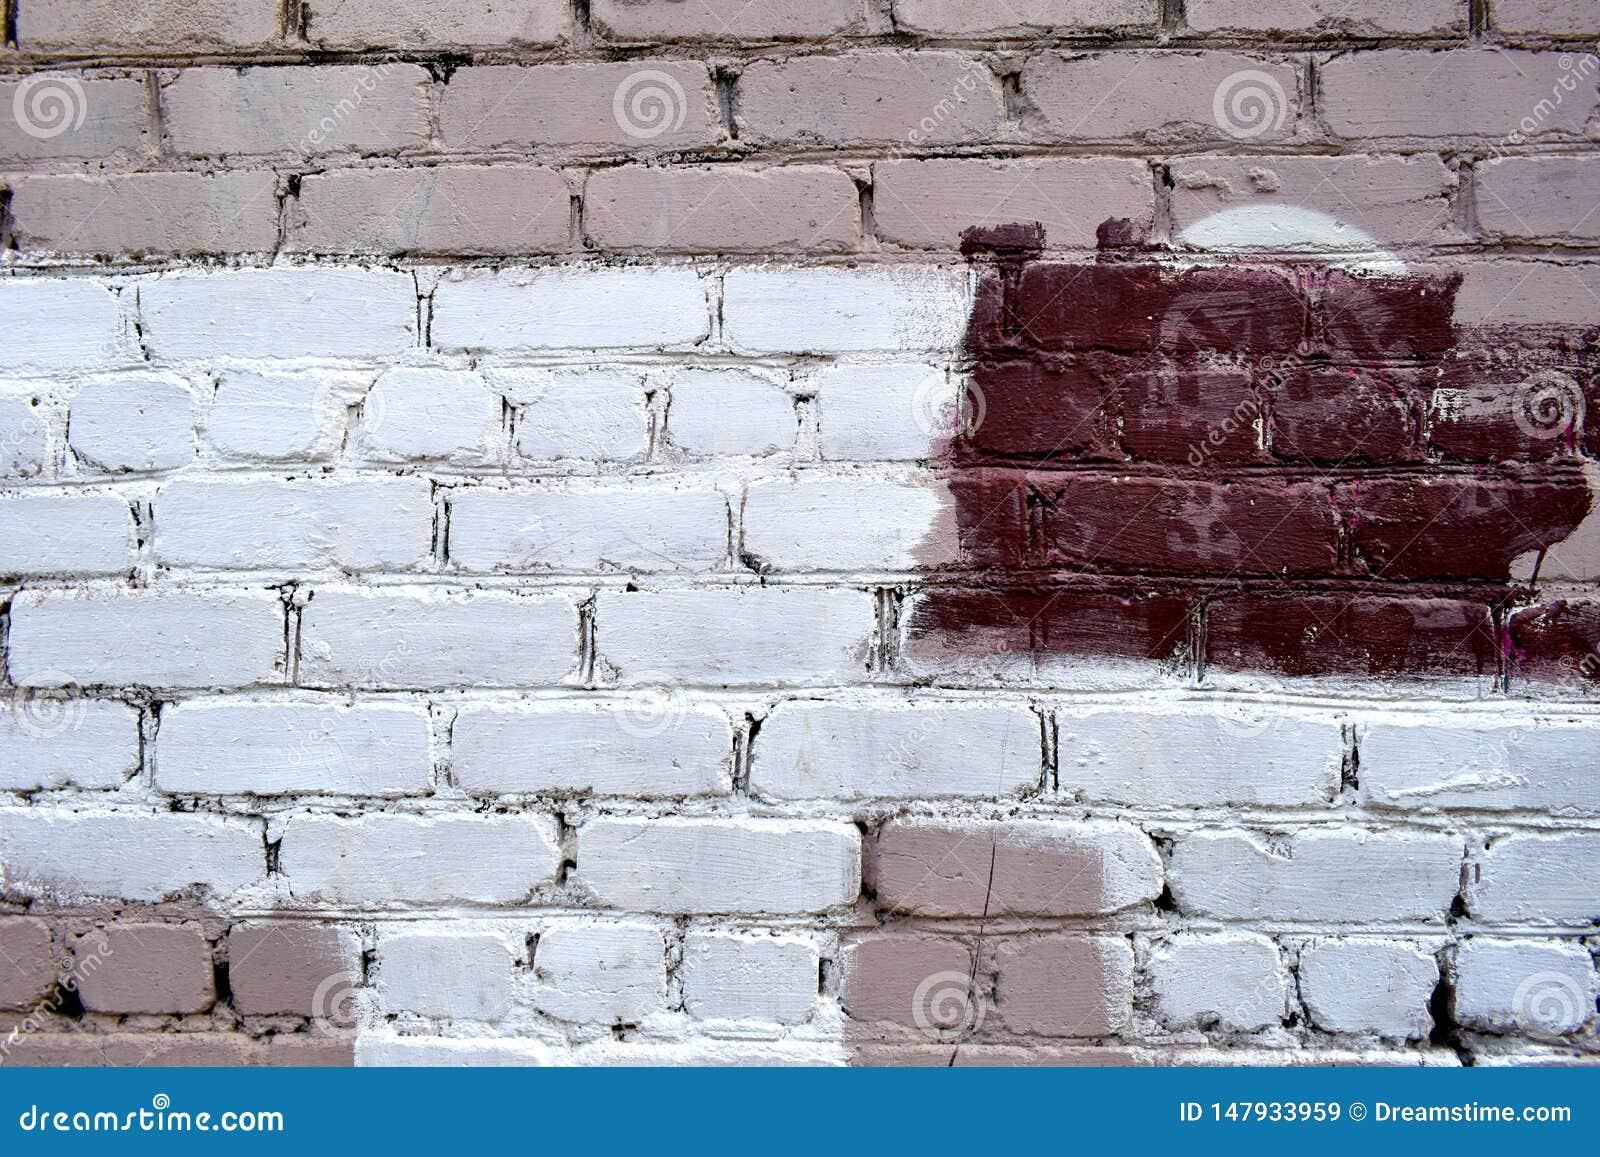 Старая кирпичная стена с белыми и красными пятнами краски